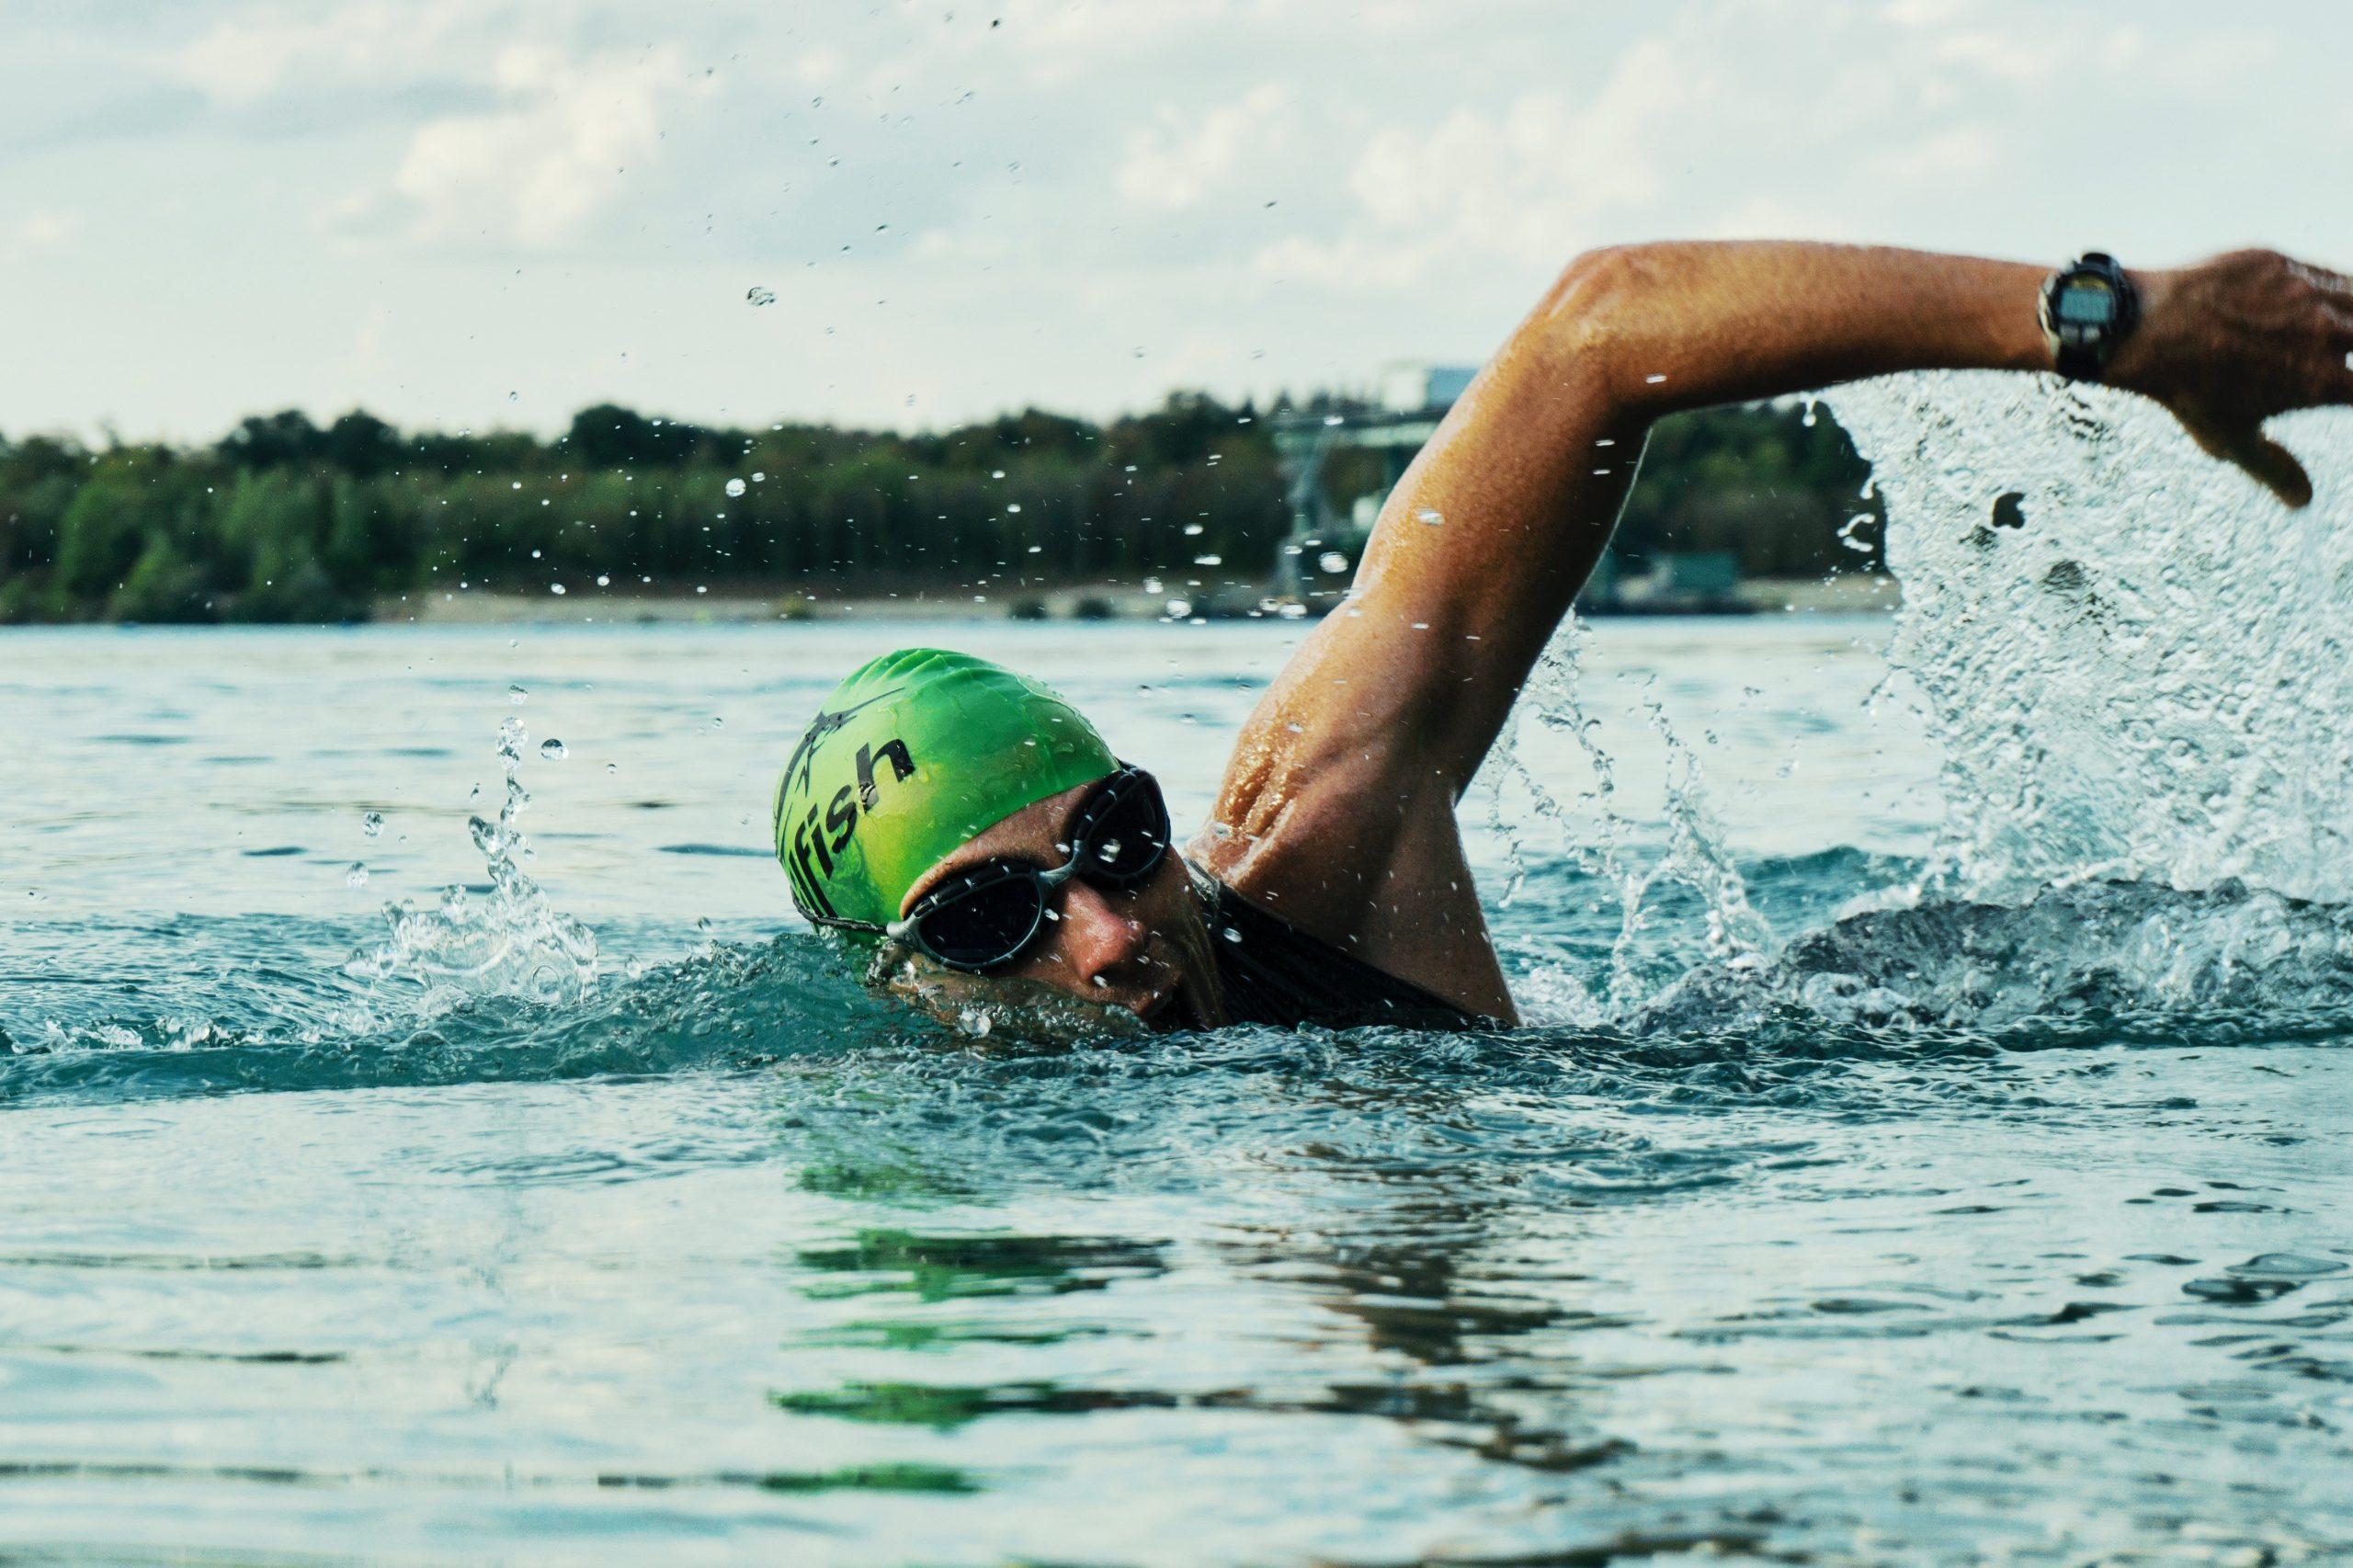 nadando con reloj